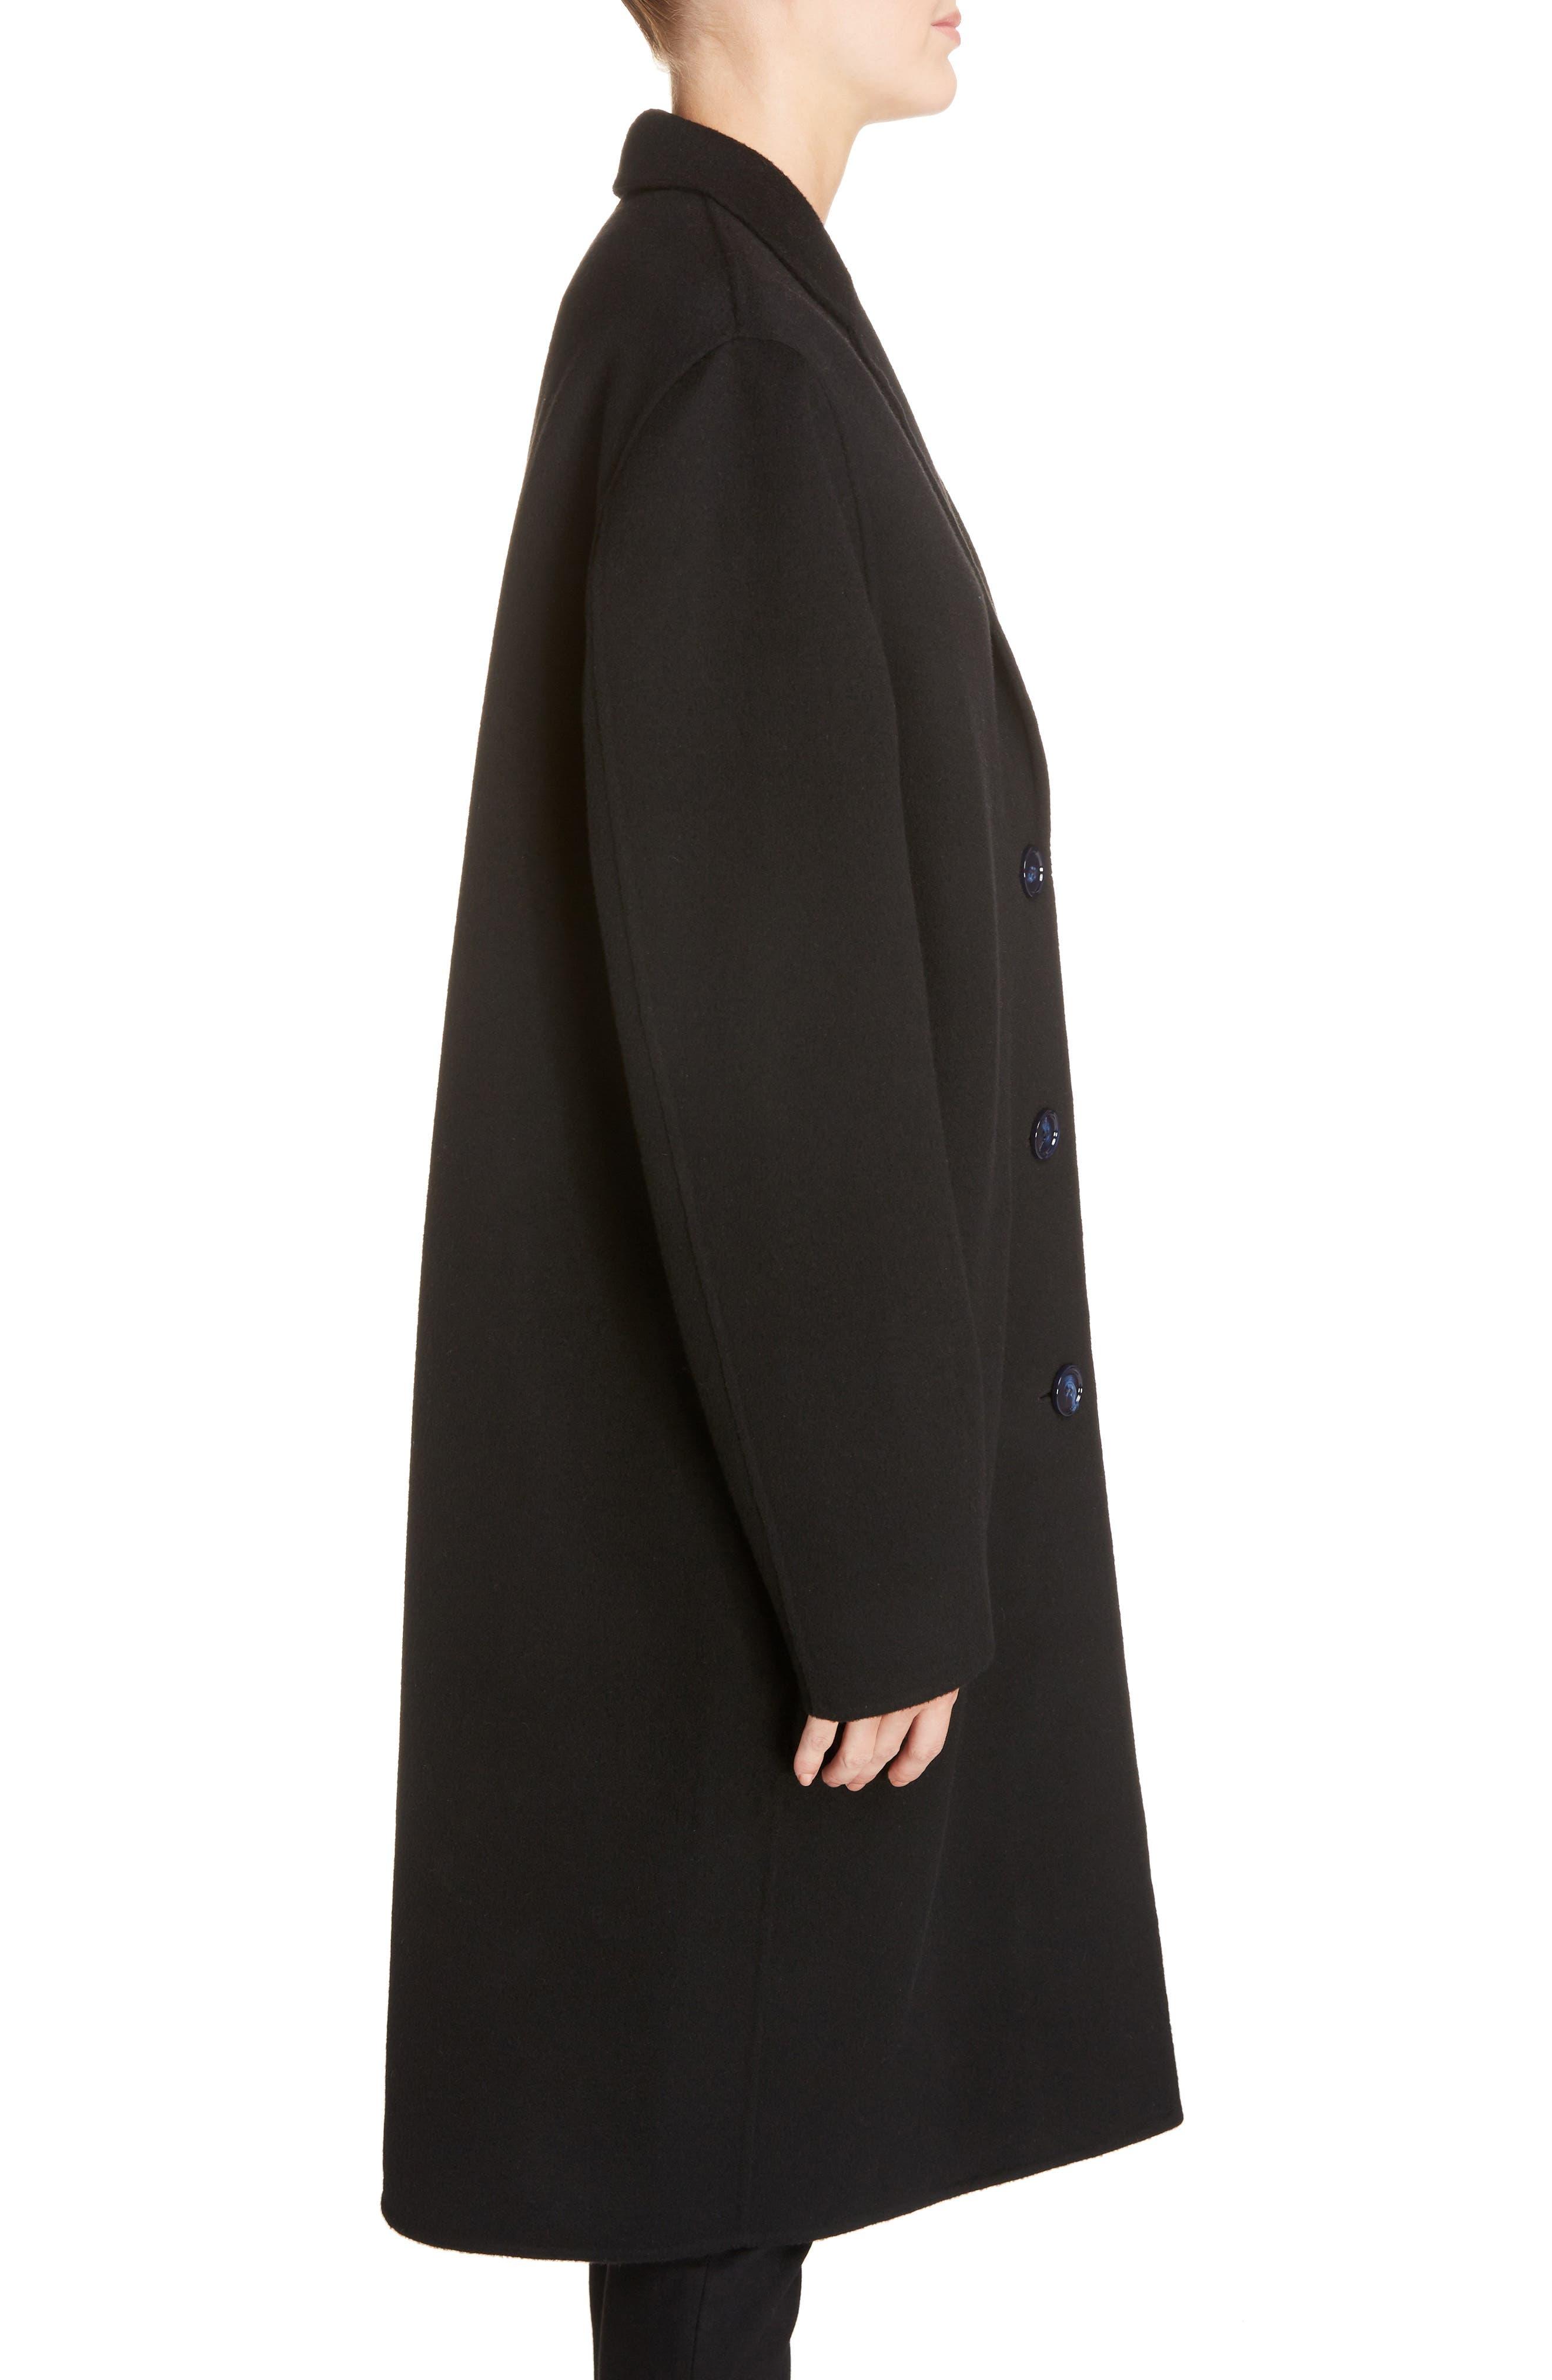 Avalon Wool & Cashmere Coat,                             Alternate thumbnail 3, color,                             Black